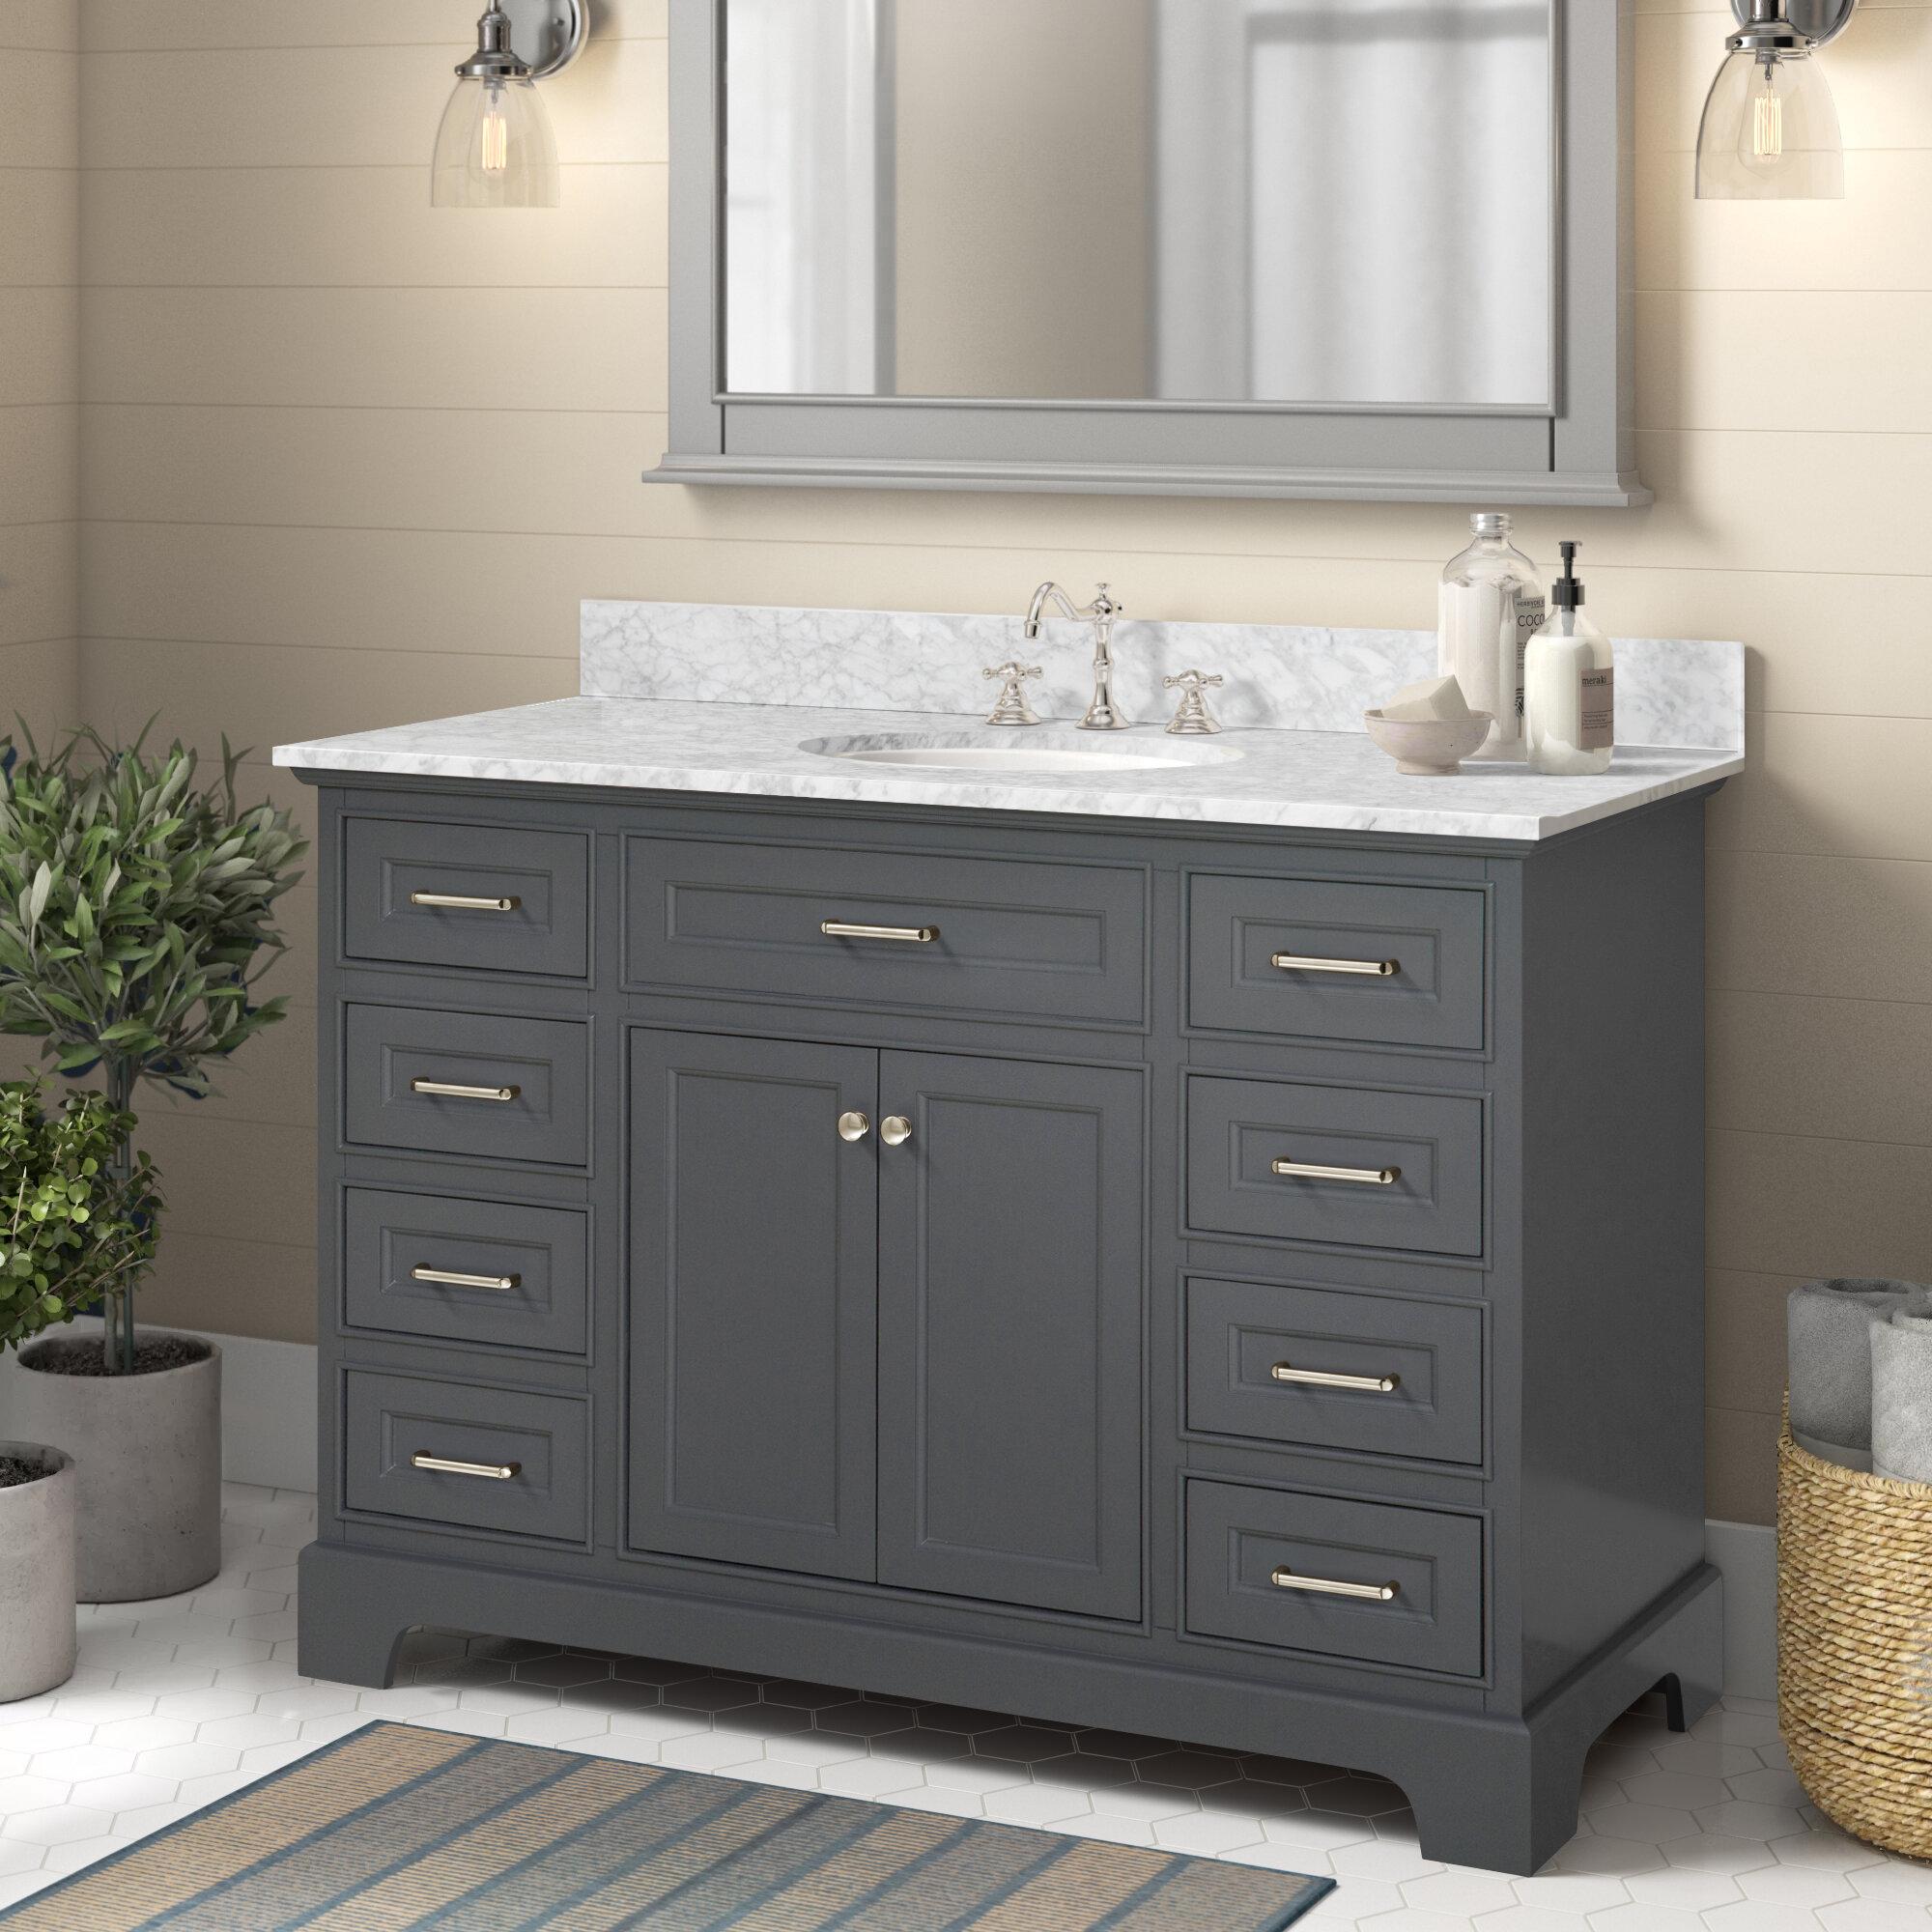 Wayfair 48 Inch Gray Bathroom Vanities You Ll Love In 2021